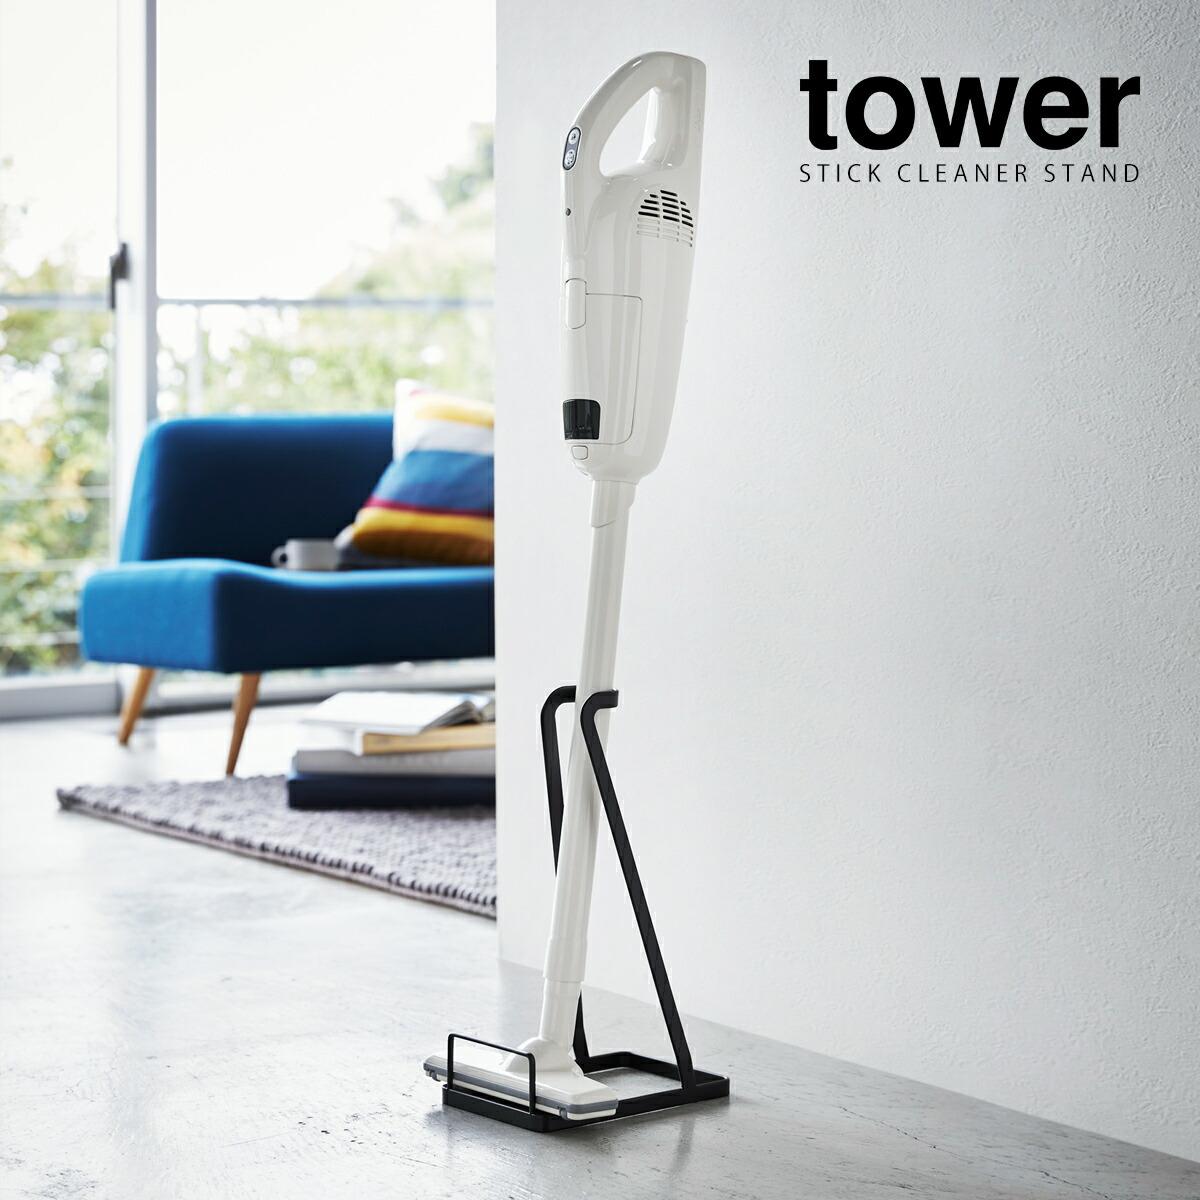 tower / タワー スティッククリーナースタンド スティック掃除機 ダイソン クリーナー 収納